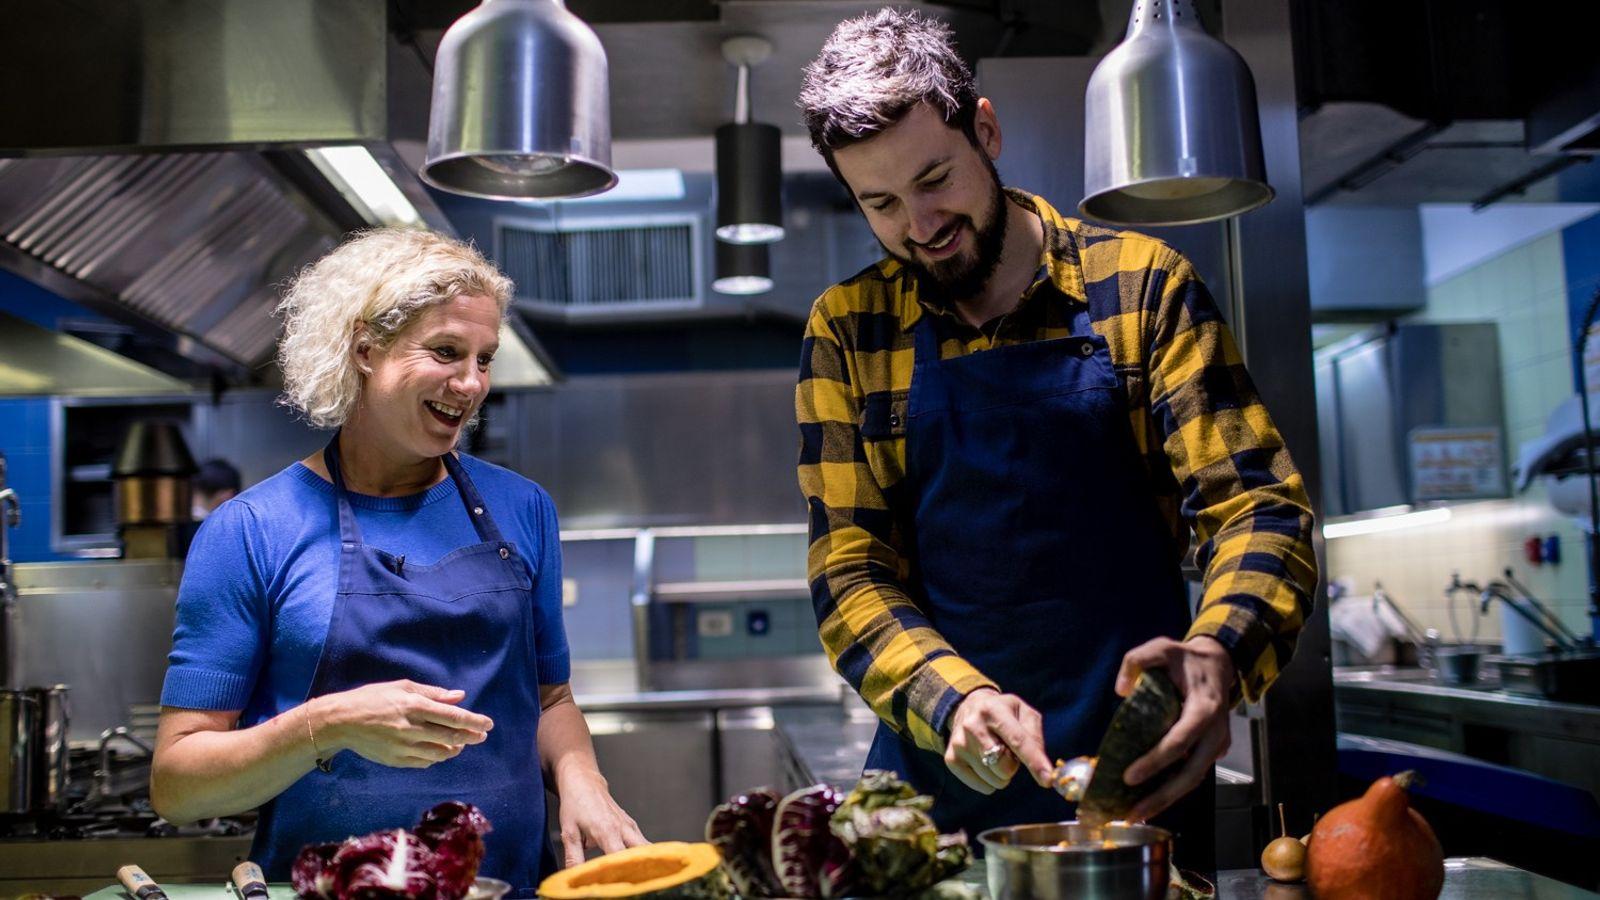 Inside the kitchen of her restaurant Hiša Franko, chef Ana Roš imparts some culinary wisdom to ...